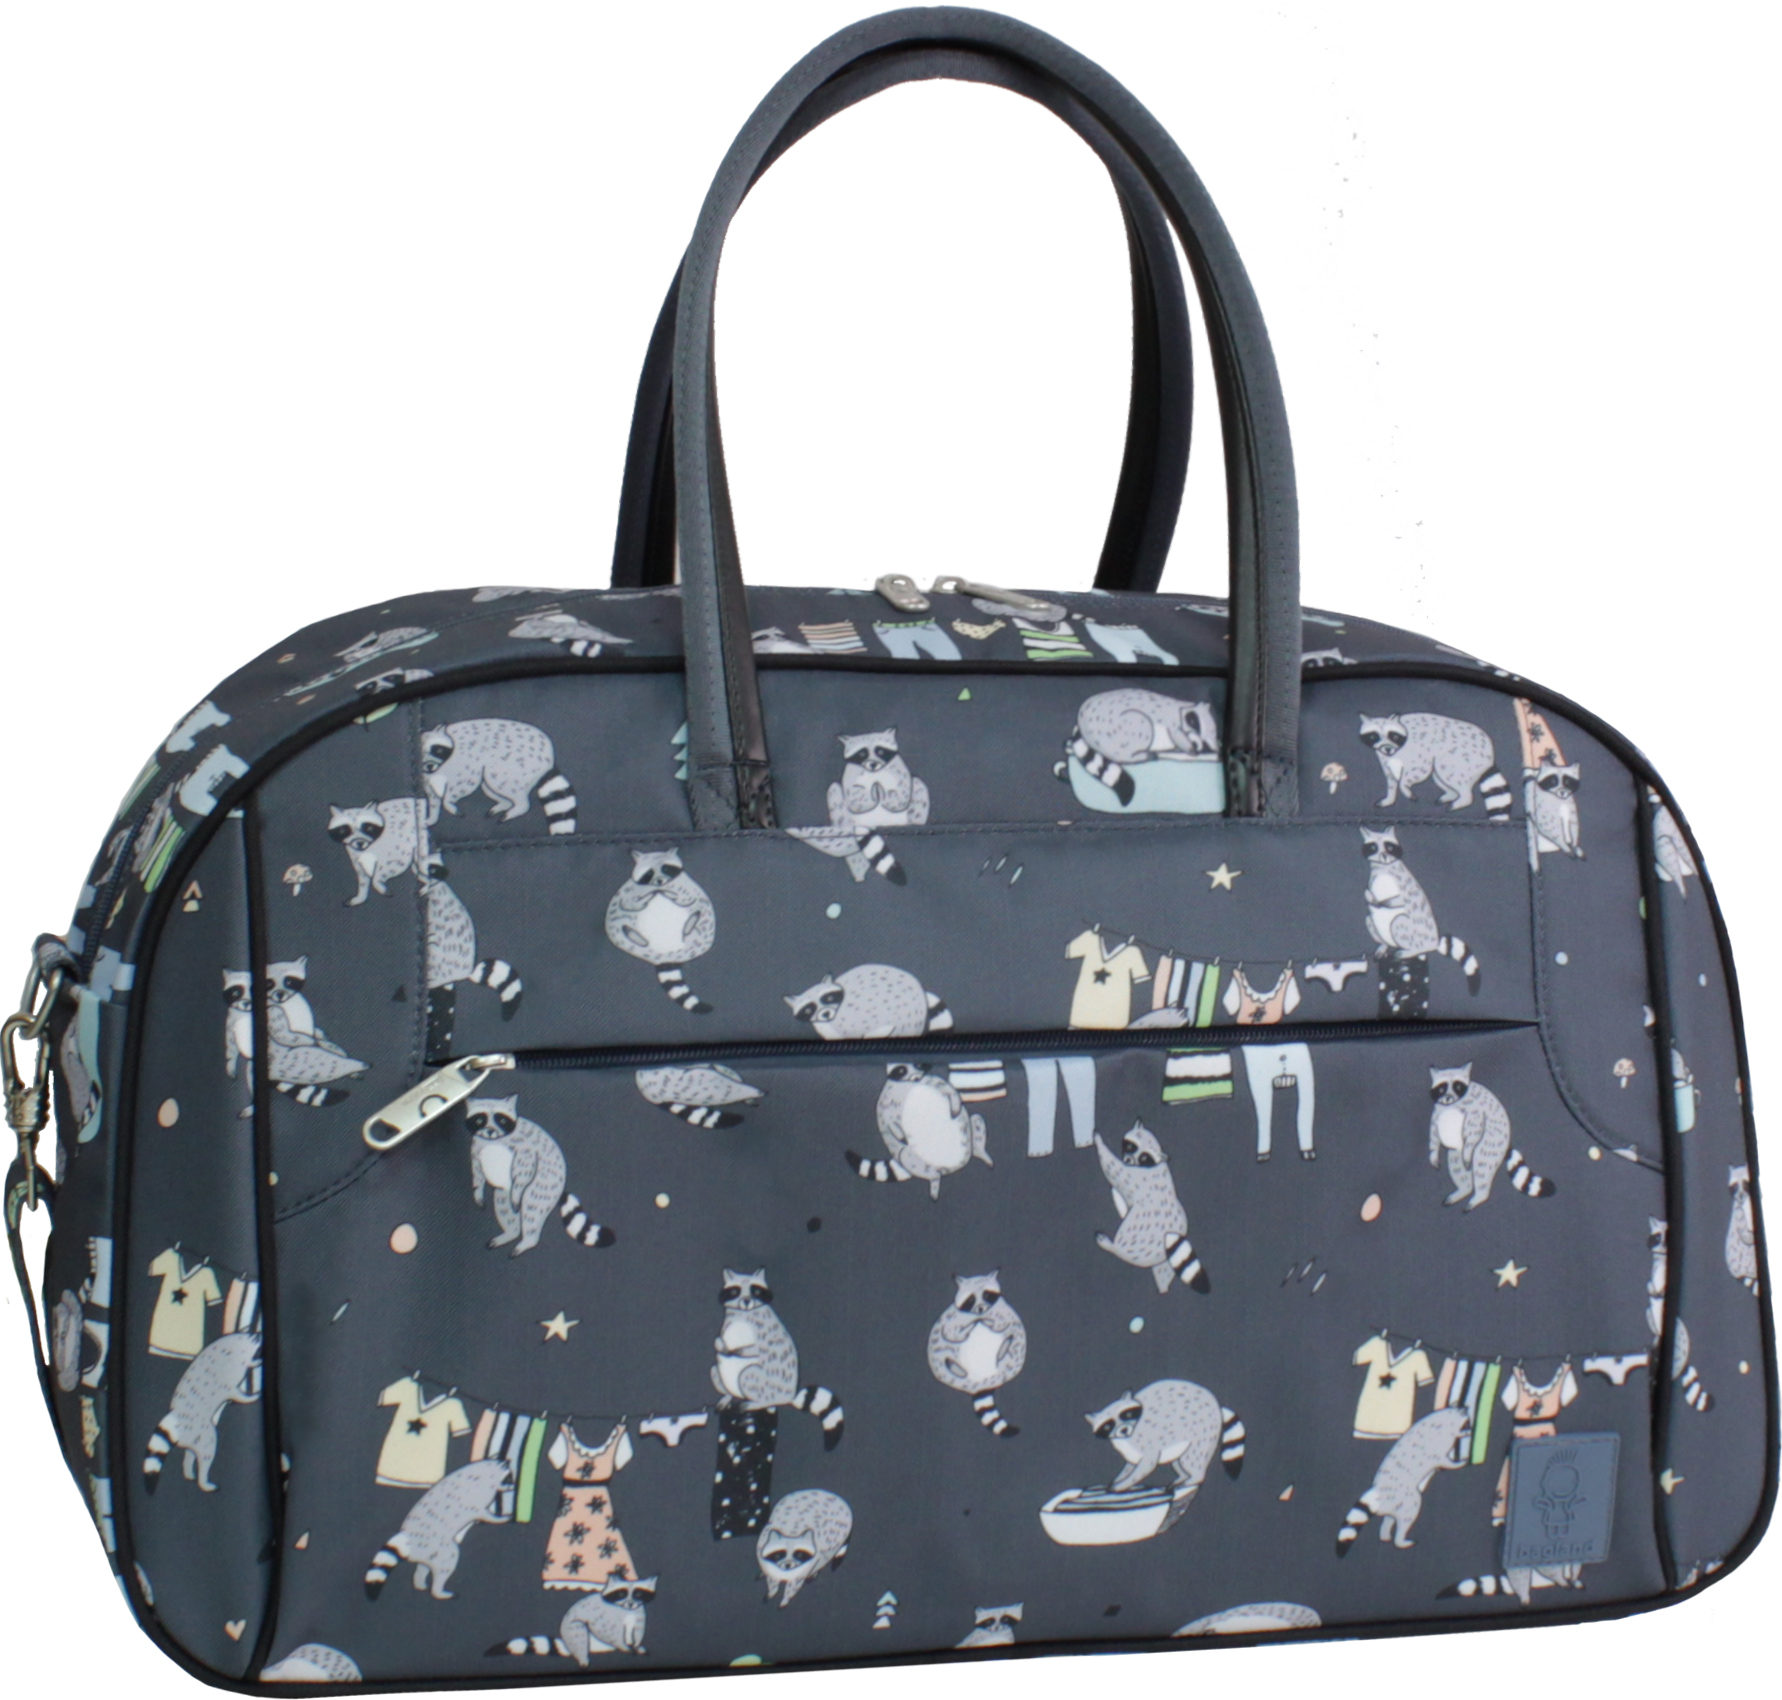 Спортивные сумки Сумка Bagland Тунис 34 л. Сублимация 220 (00390664) IMG_9067.JPG